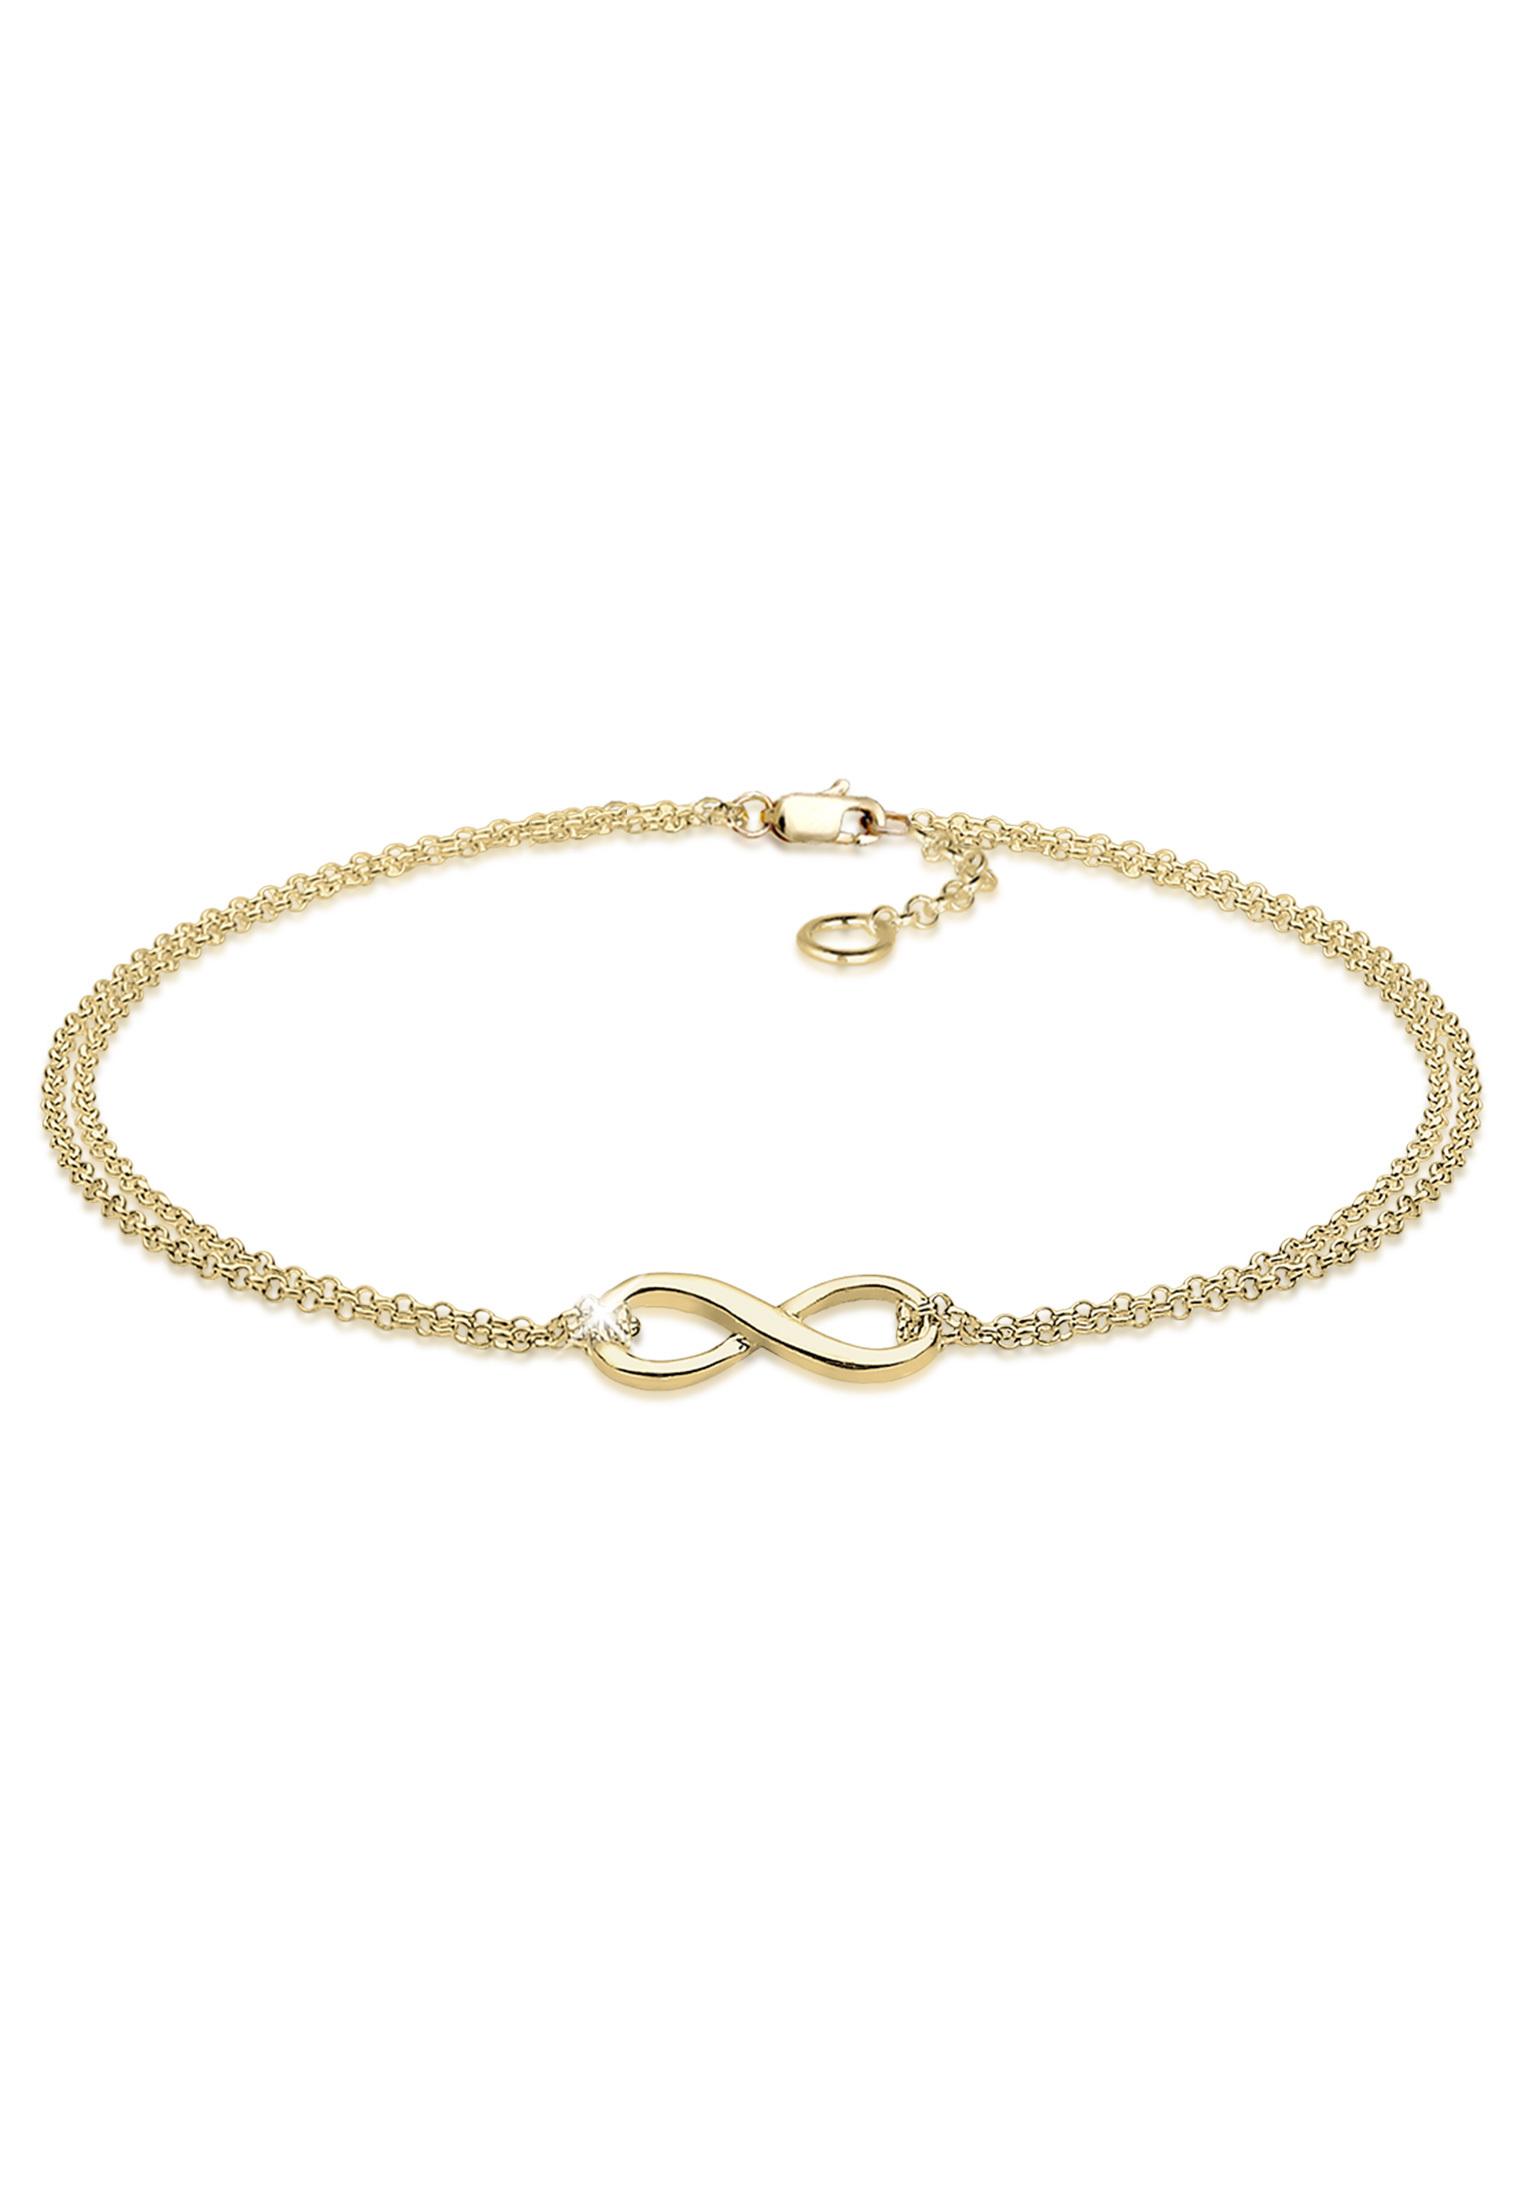 Armband Infinity | 375 Gelbgold